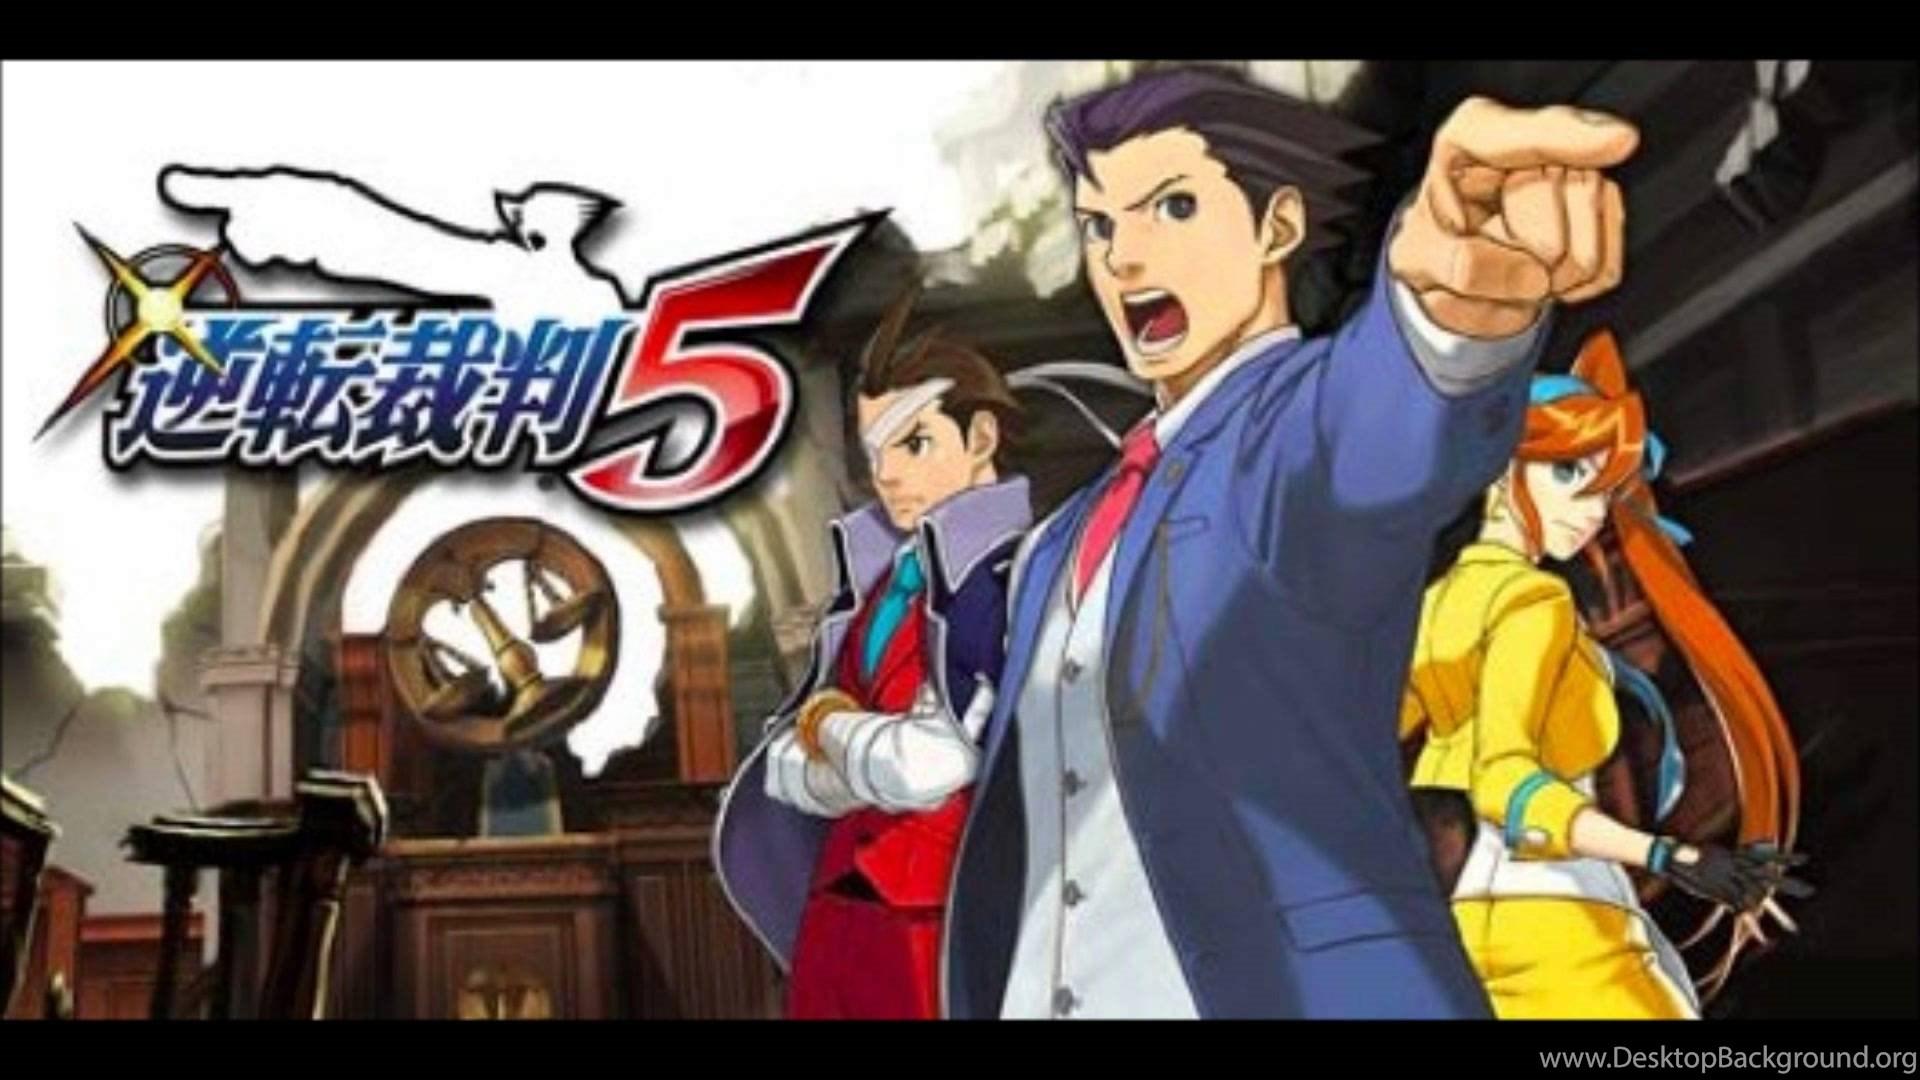 Phoenix Wright Ace Attorney 5 Dual Destinies Demo Soundtrack